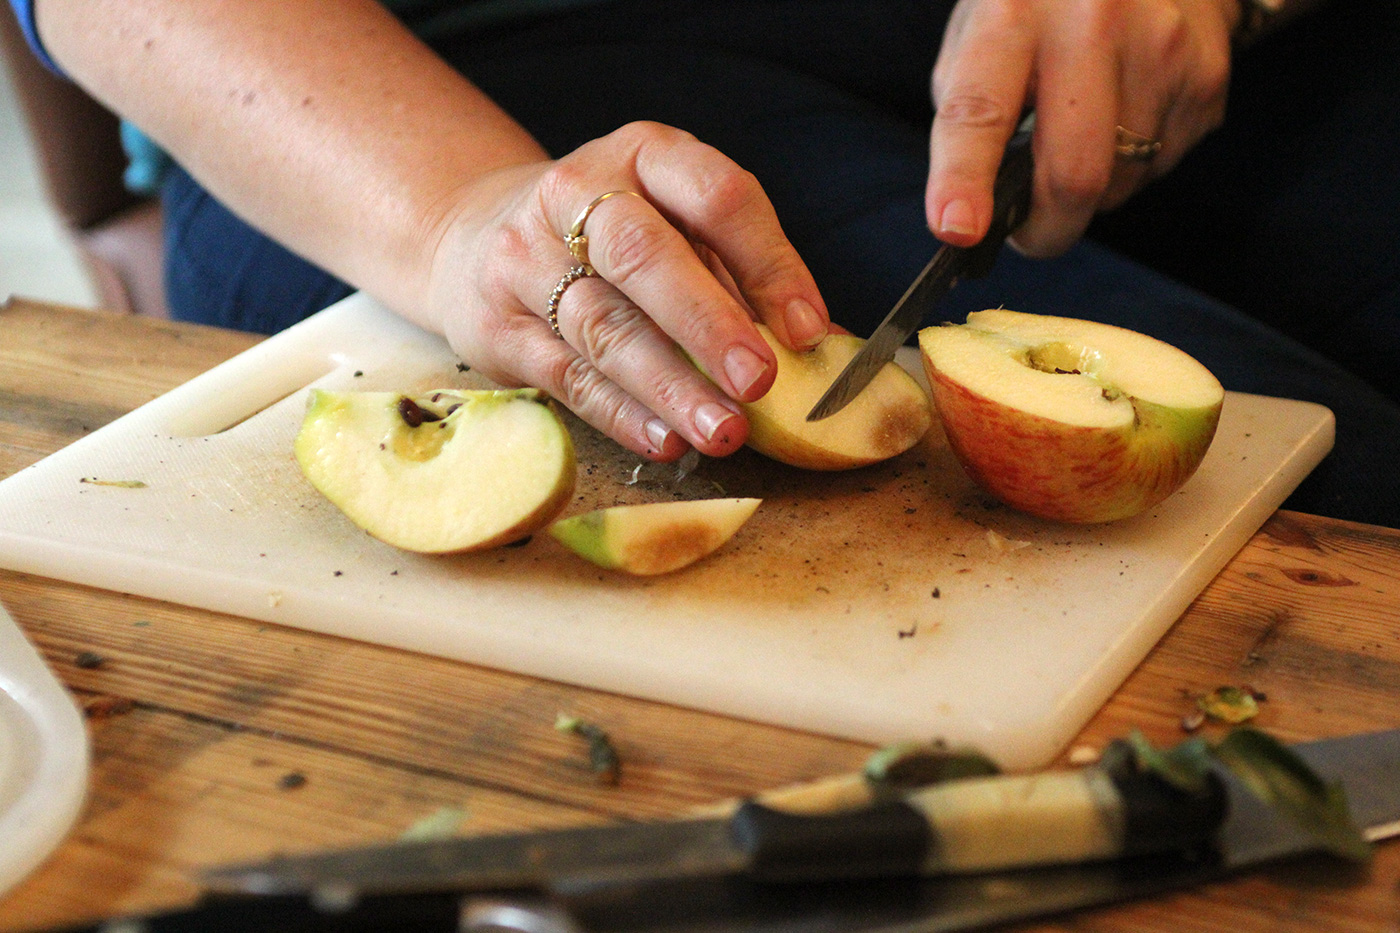 cider-maken-appel-snijden